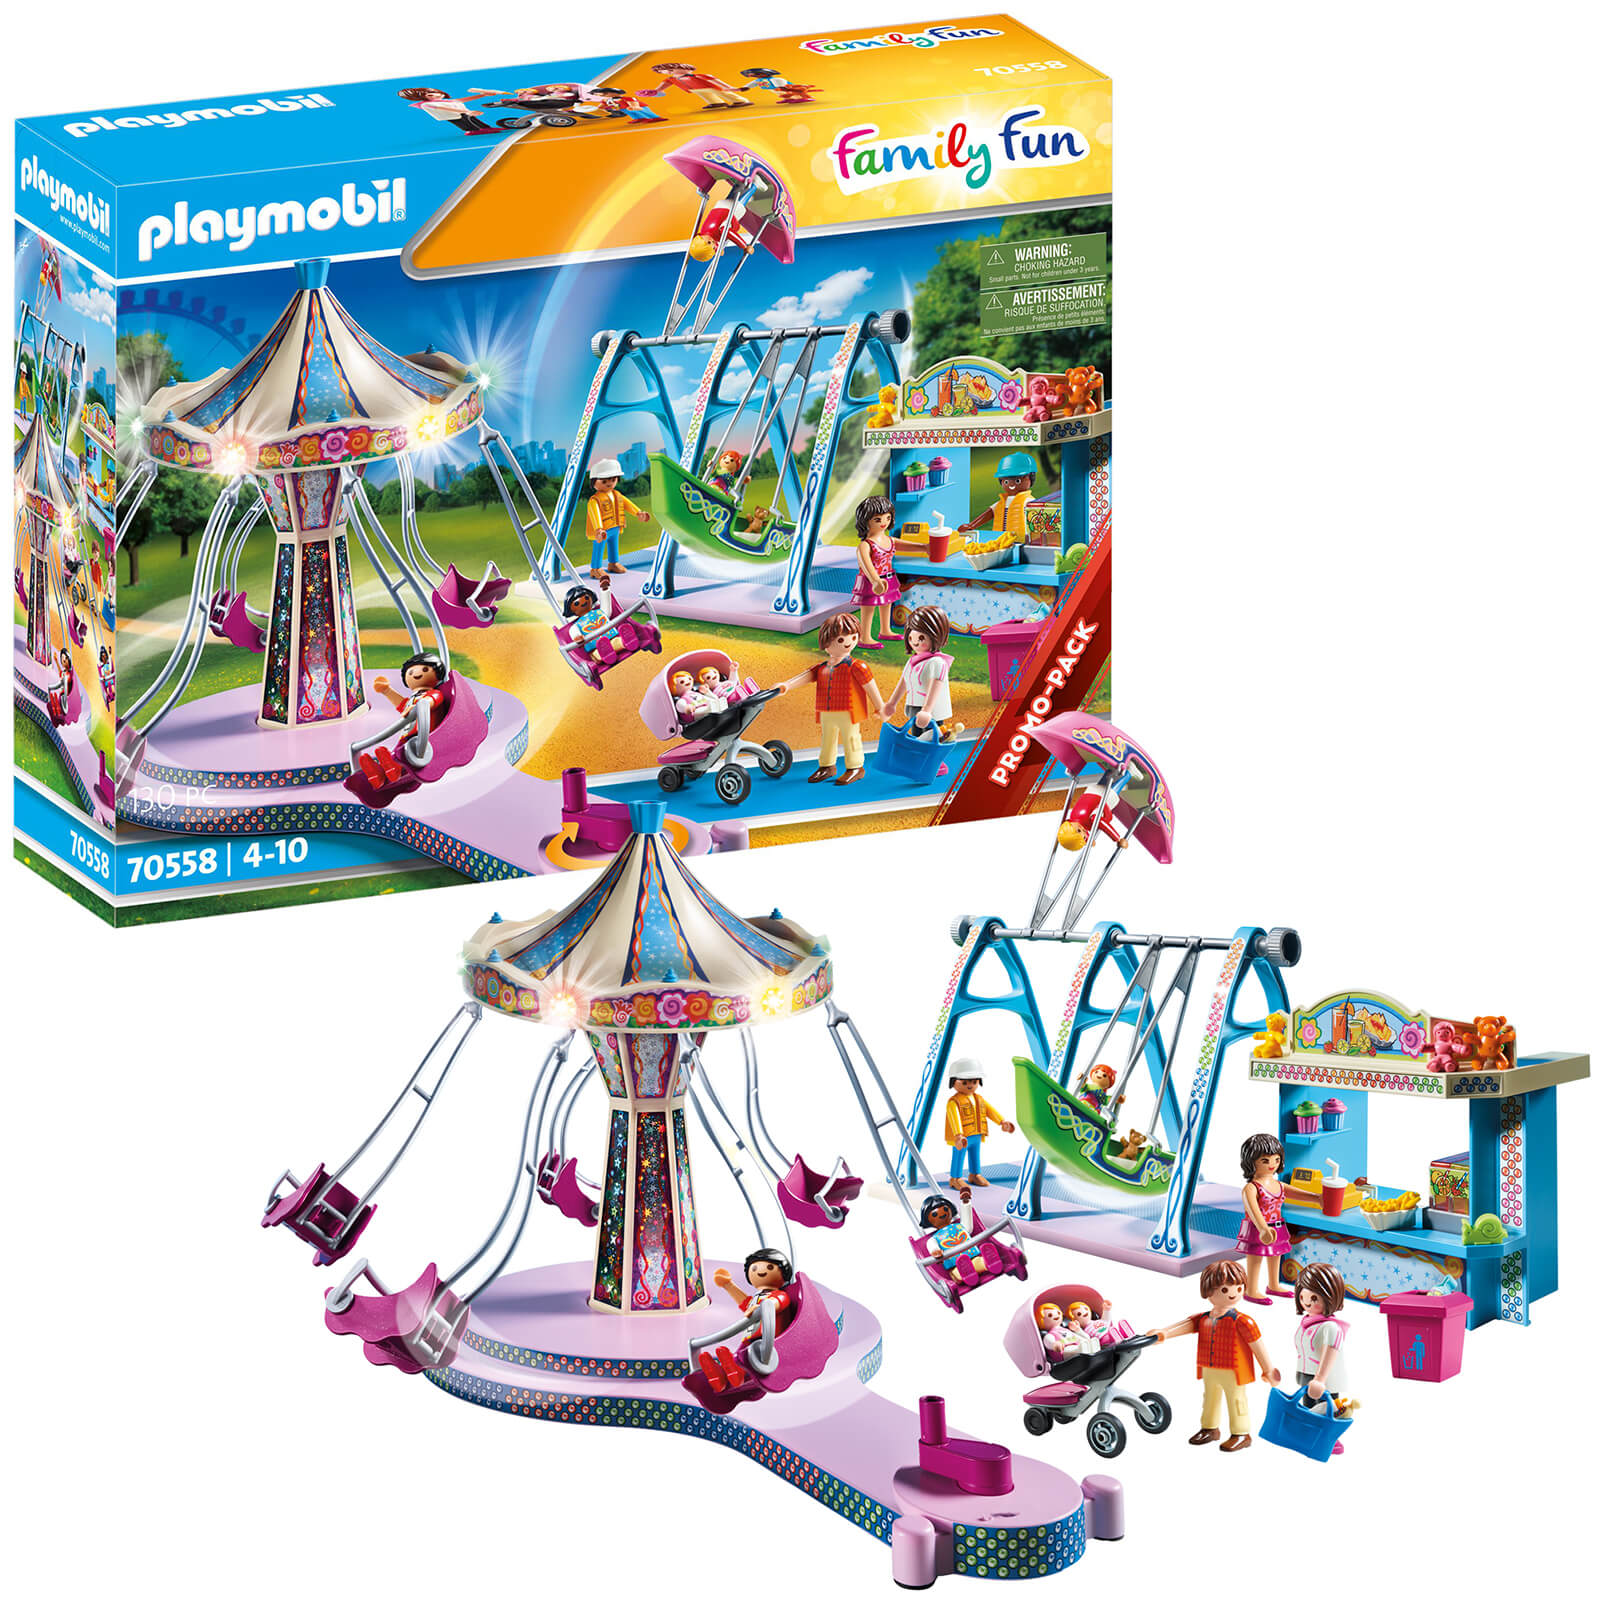 Playmobil Family Fun Promo Large County Fair (70558)